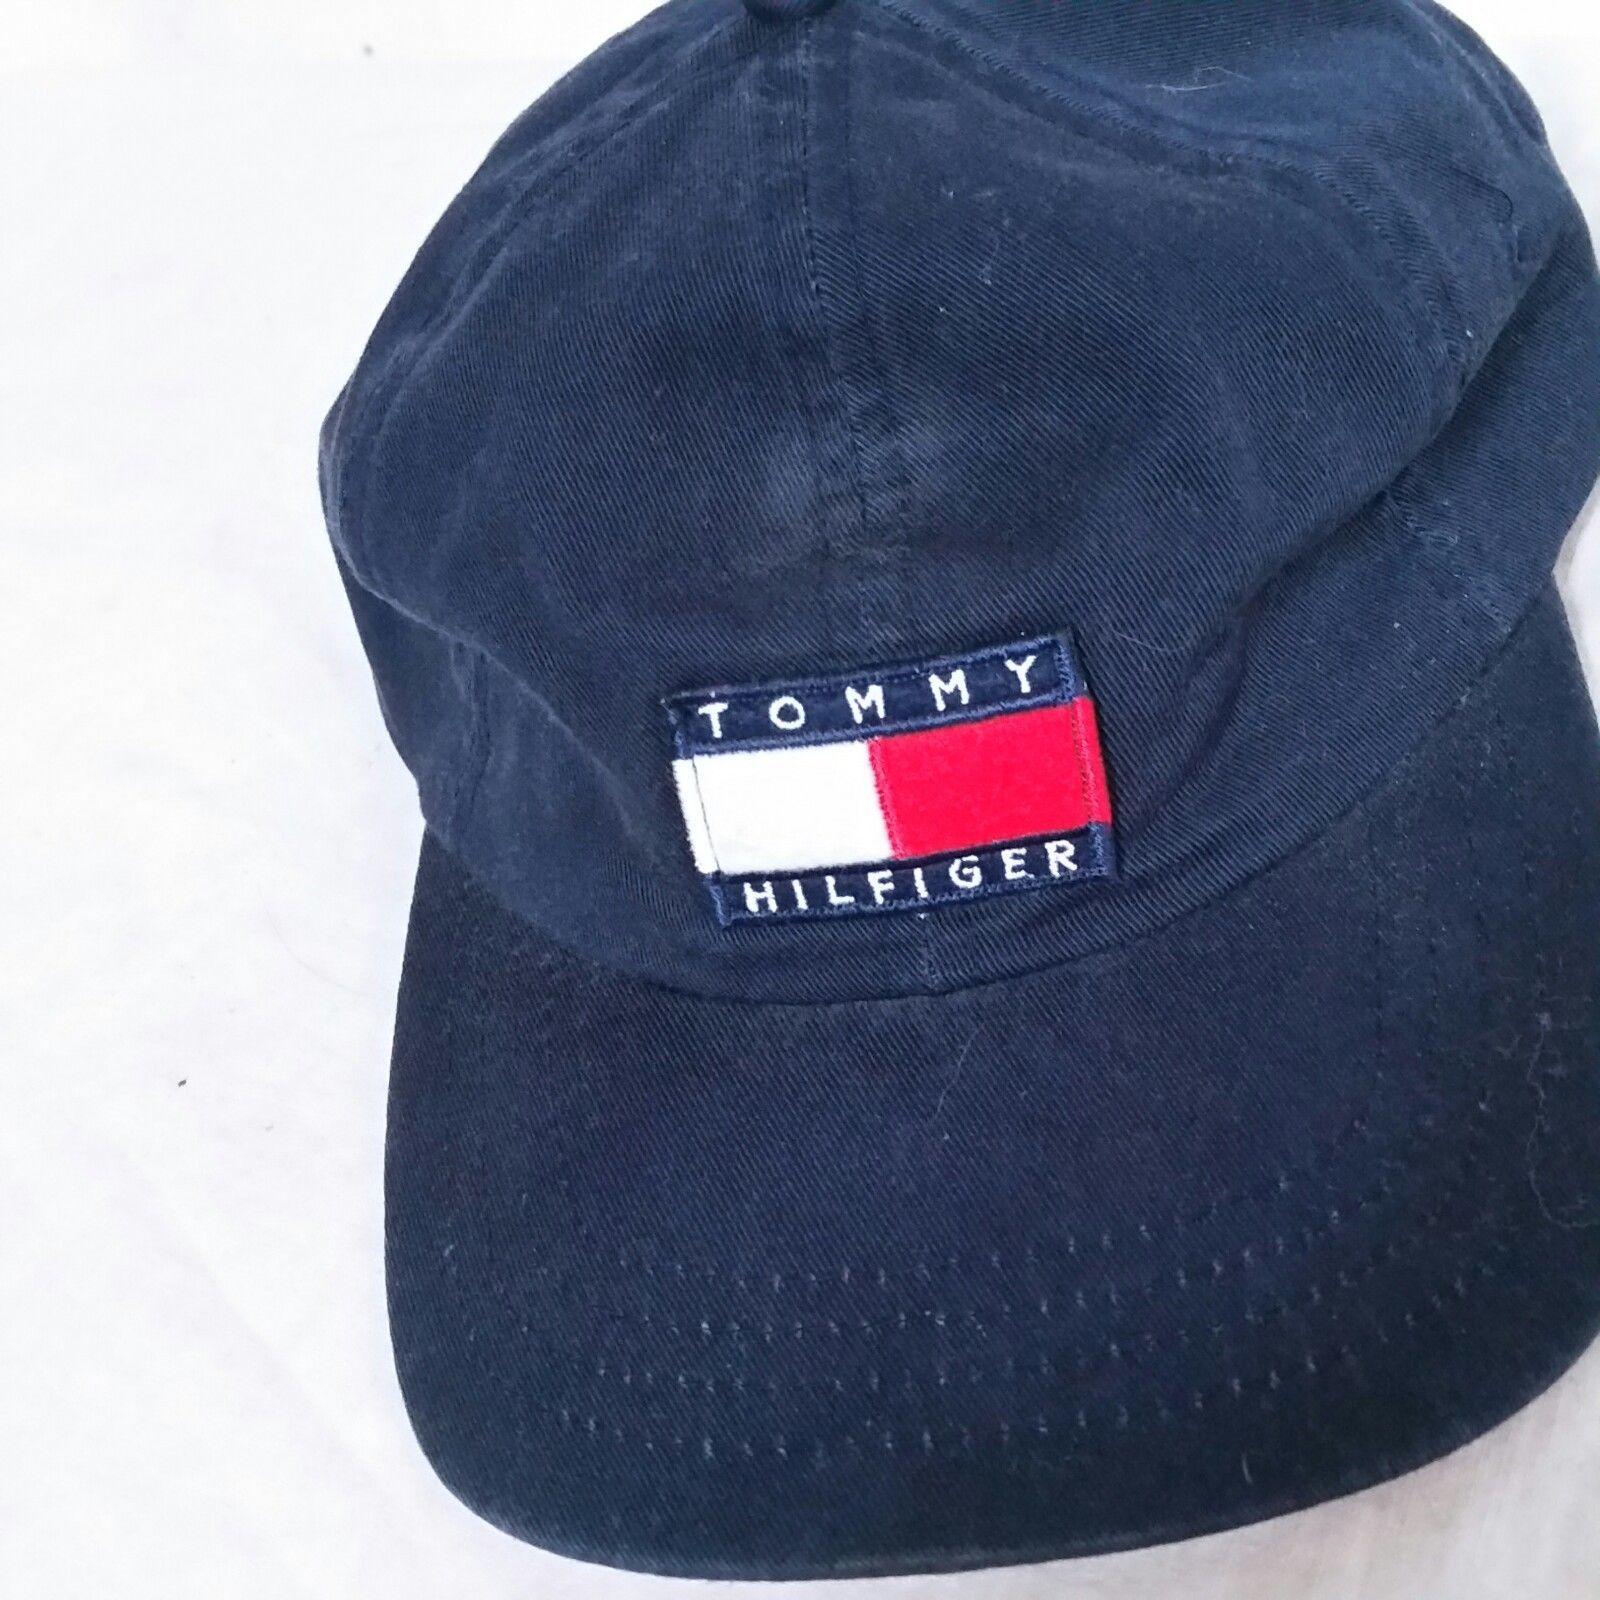 e8d1439cf6ce VTG Tommy Hilfiger Snapback Hat Flag 90s Lotus Sailing Cap Spell Out  Baseball